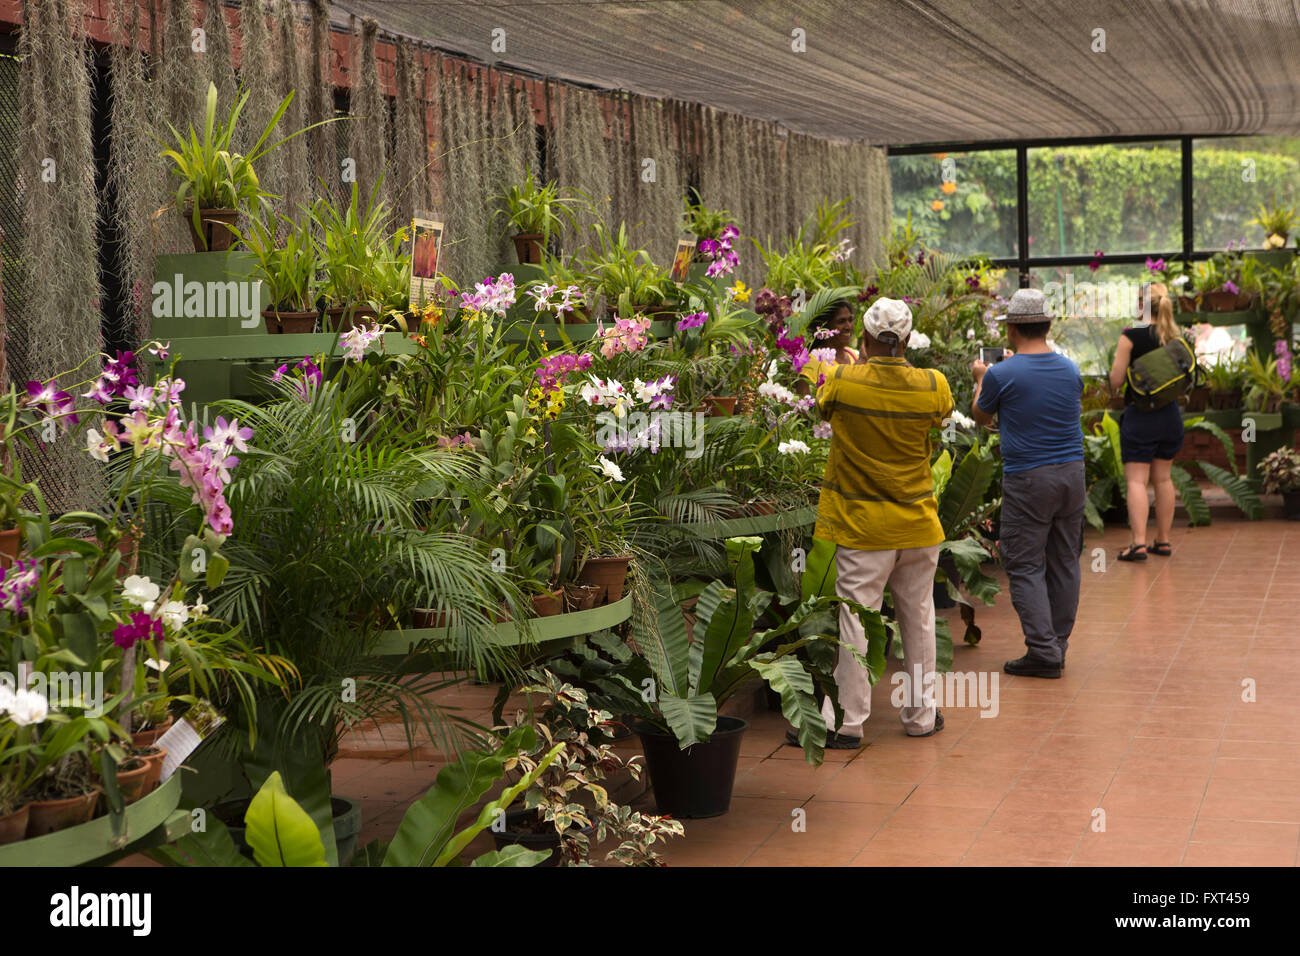 Peradeniya Botanic Garden Stock Photos & Peradeniya Botanic Garden ...